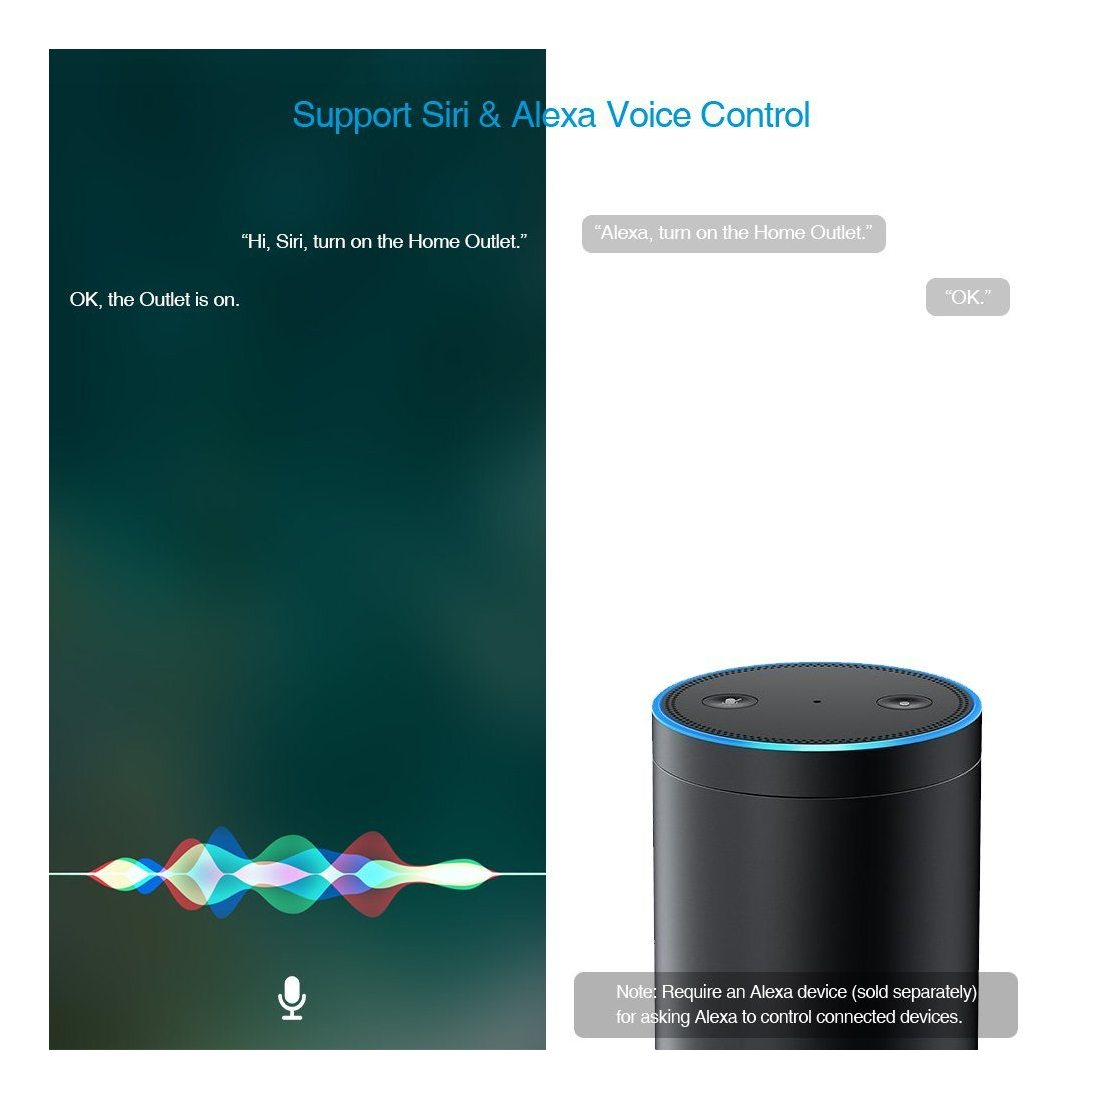 Koogeek Prise Intelligente Wifi Smart Plug 2.4GHz avec HomeKit Siri et Alexa Home app Adapt/é pour iOS 9.0 et Android 4.3